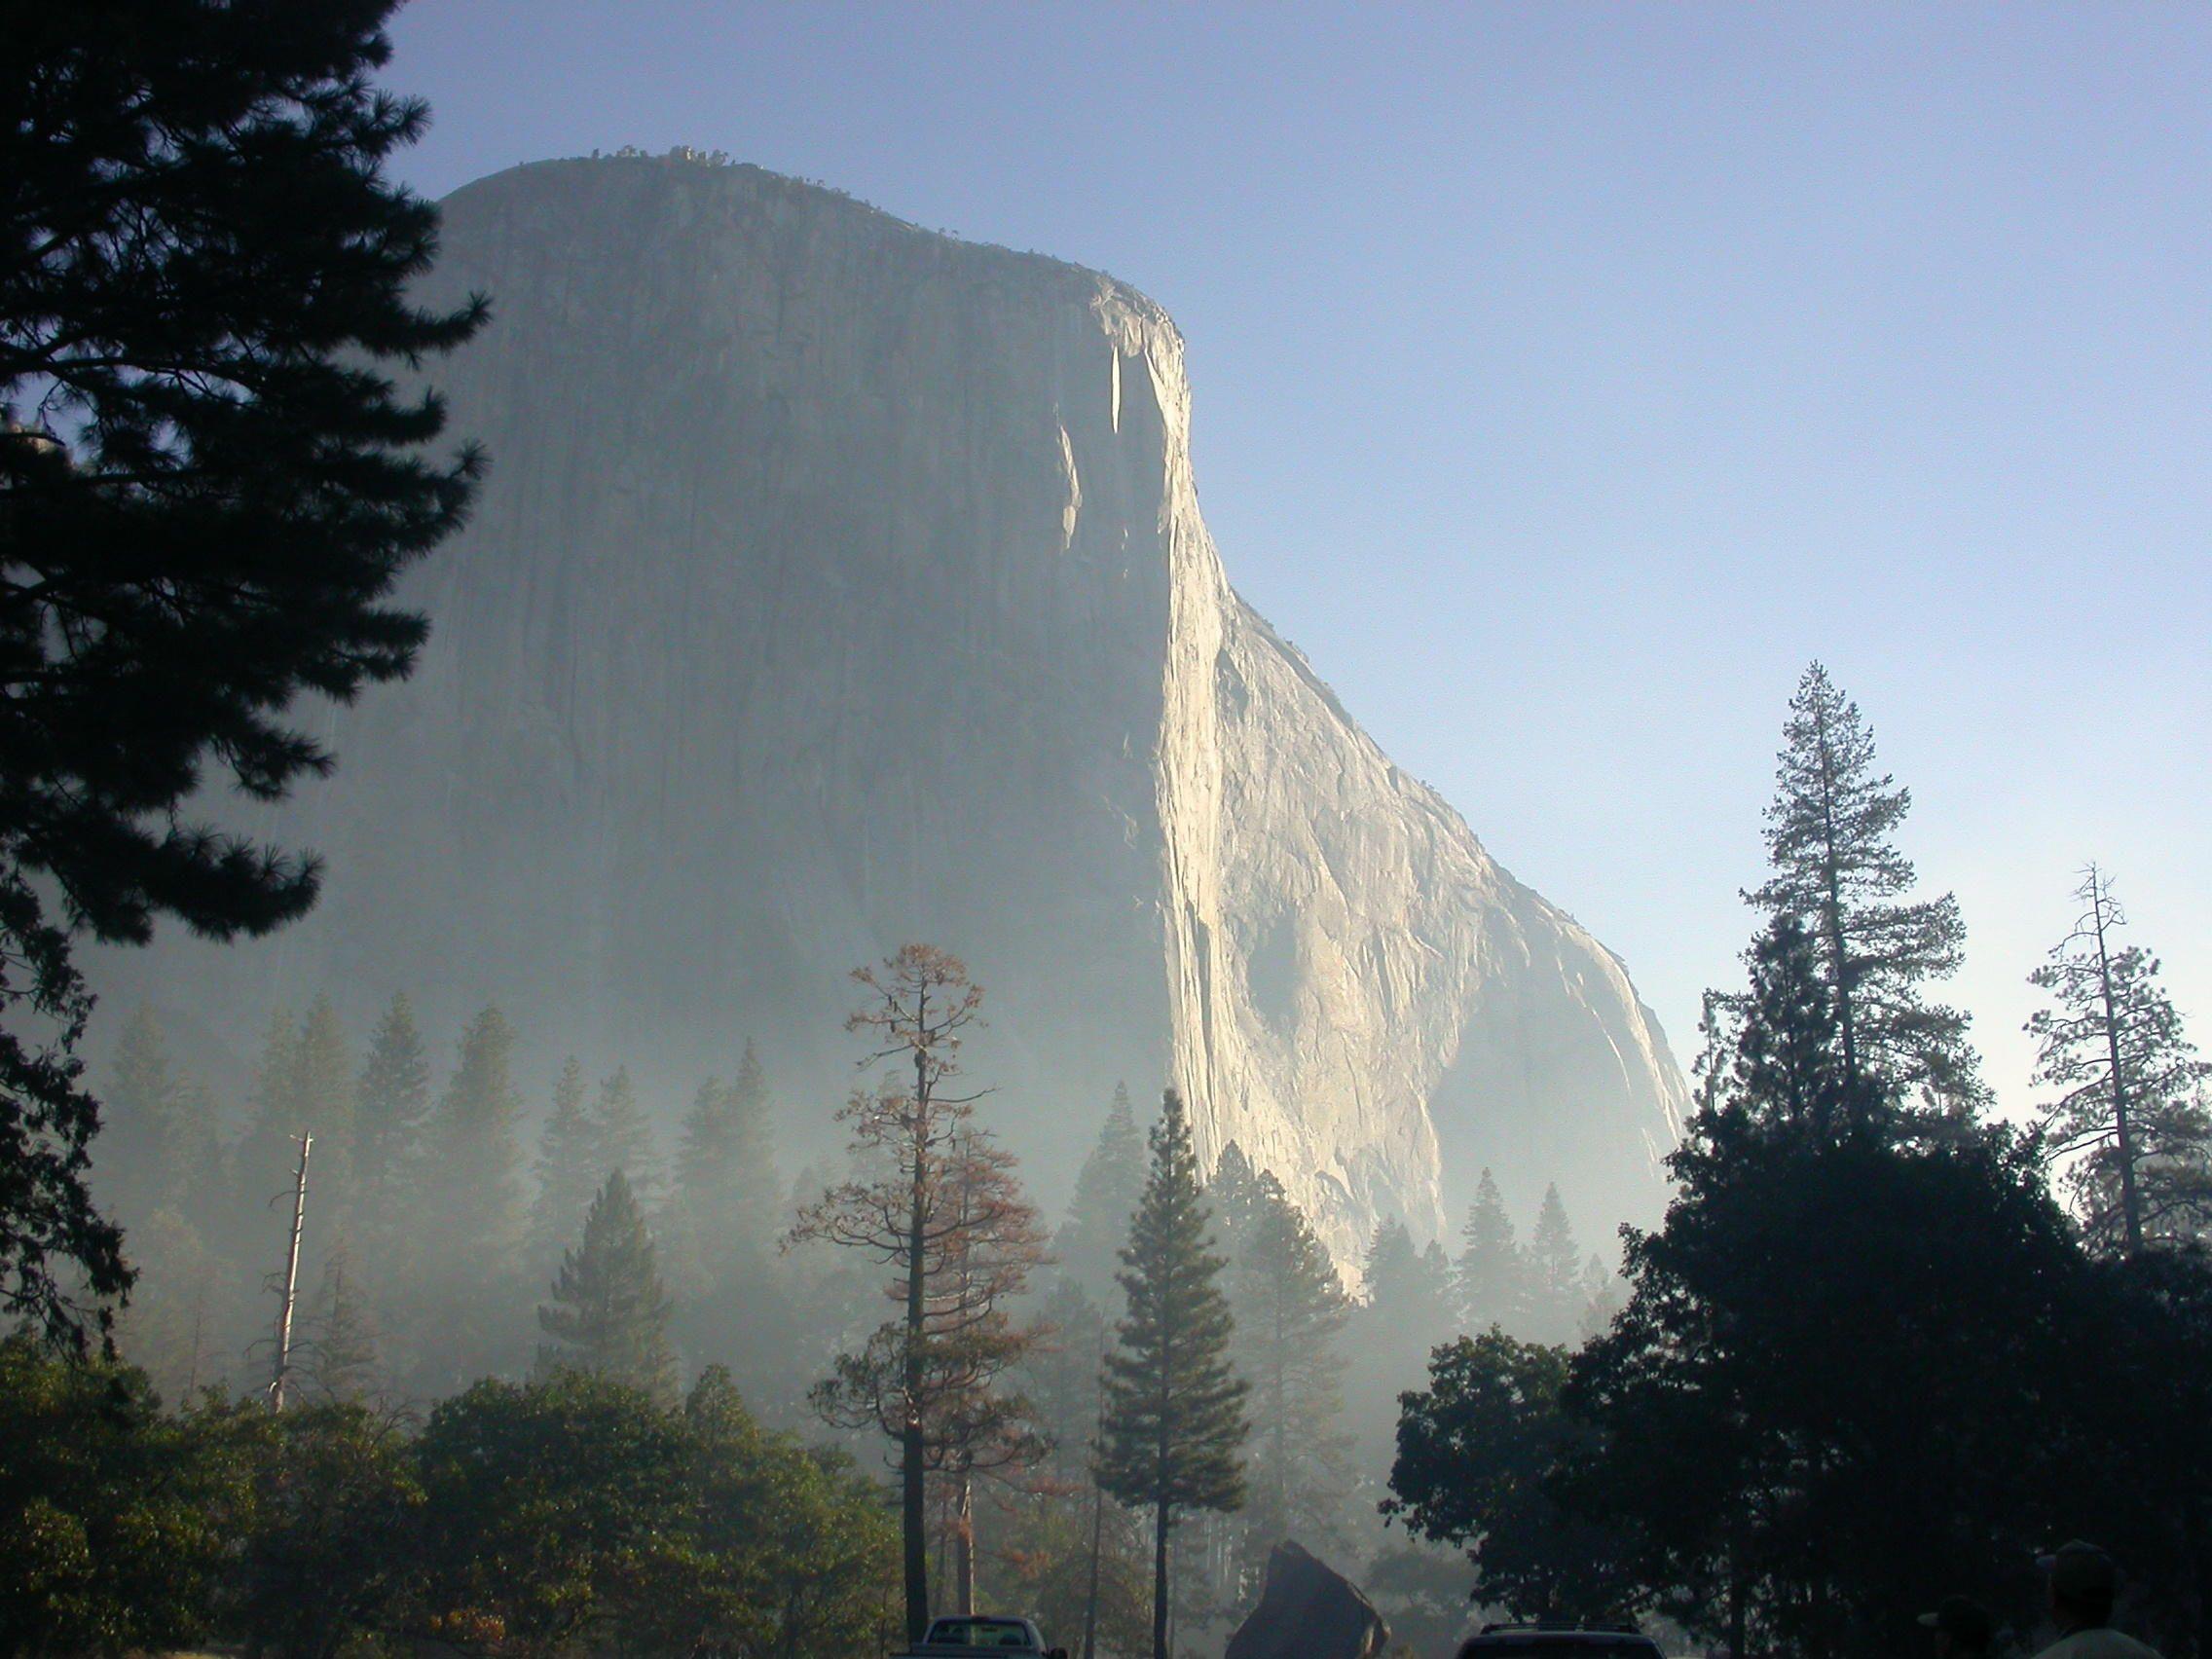 Yosemite, El Capitan